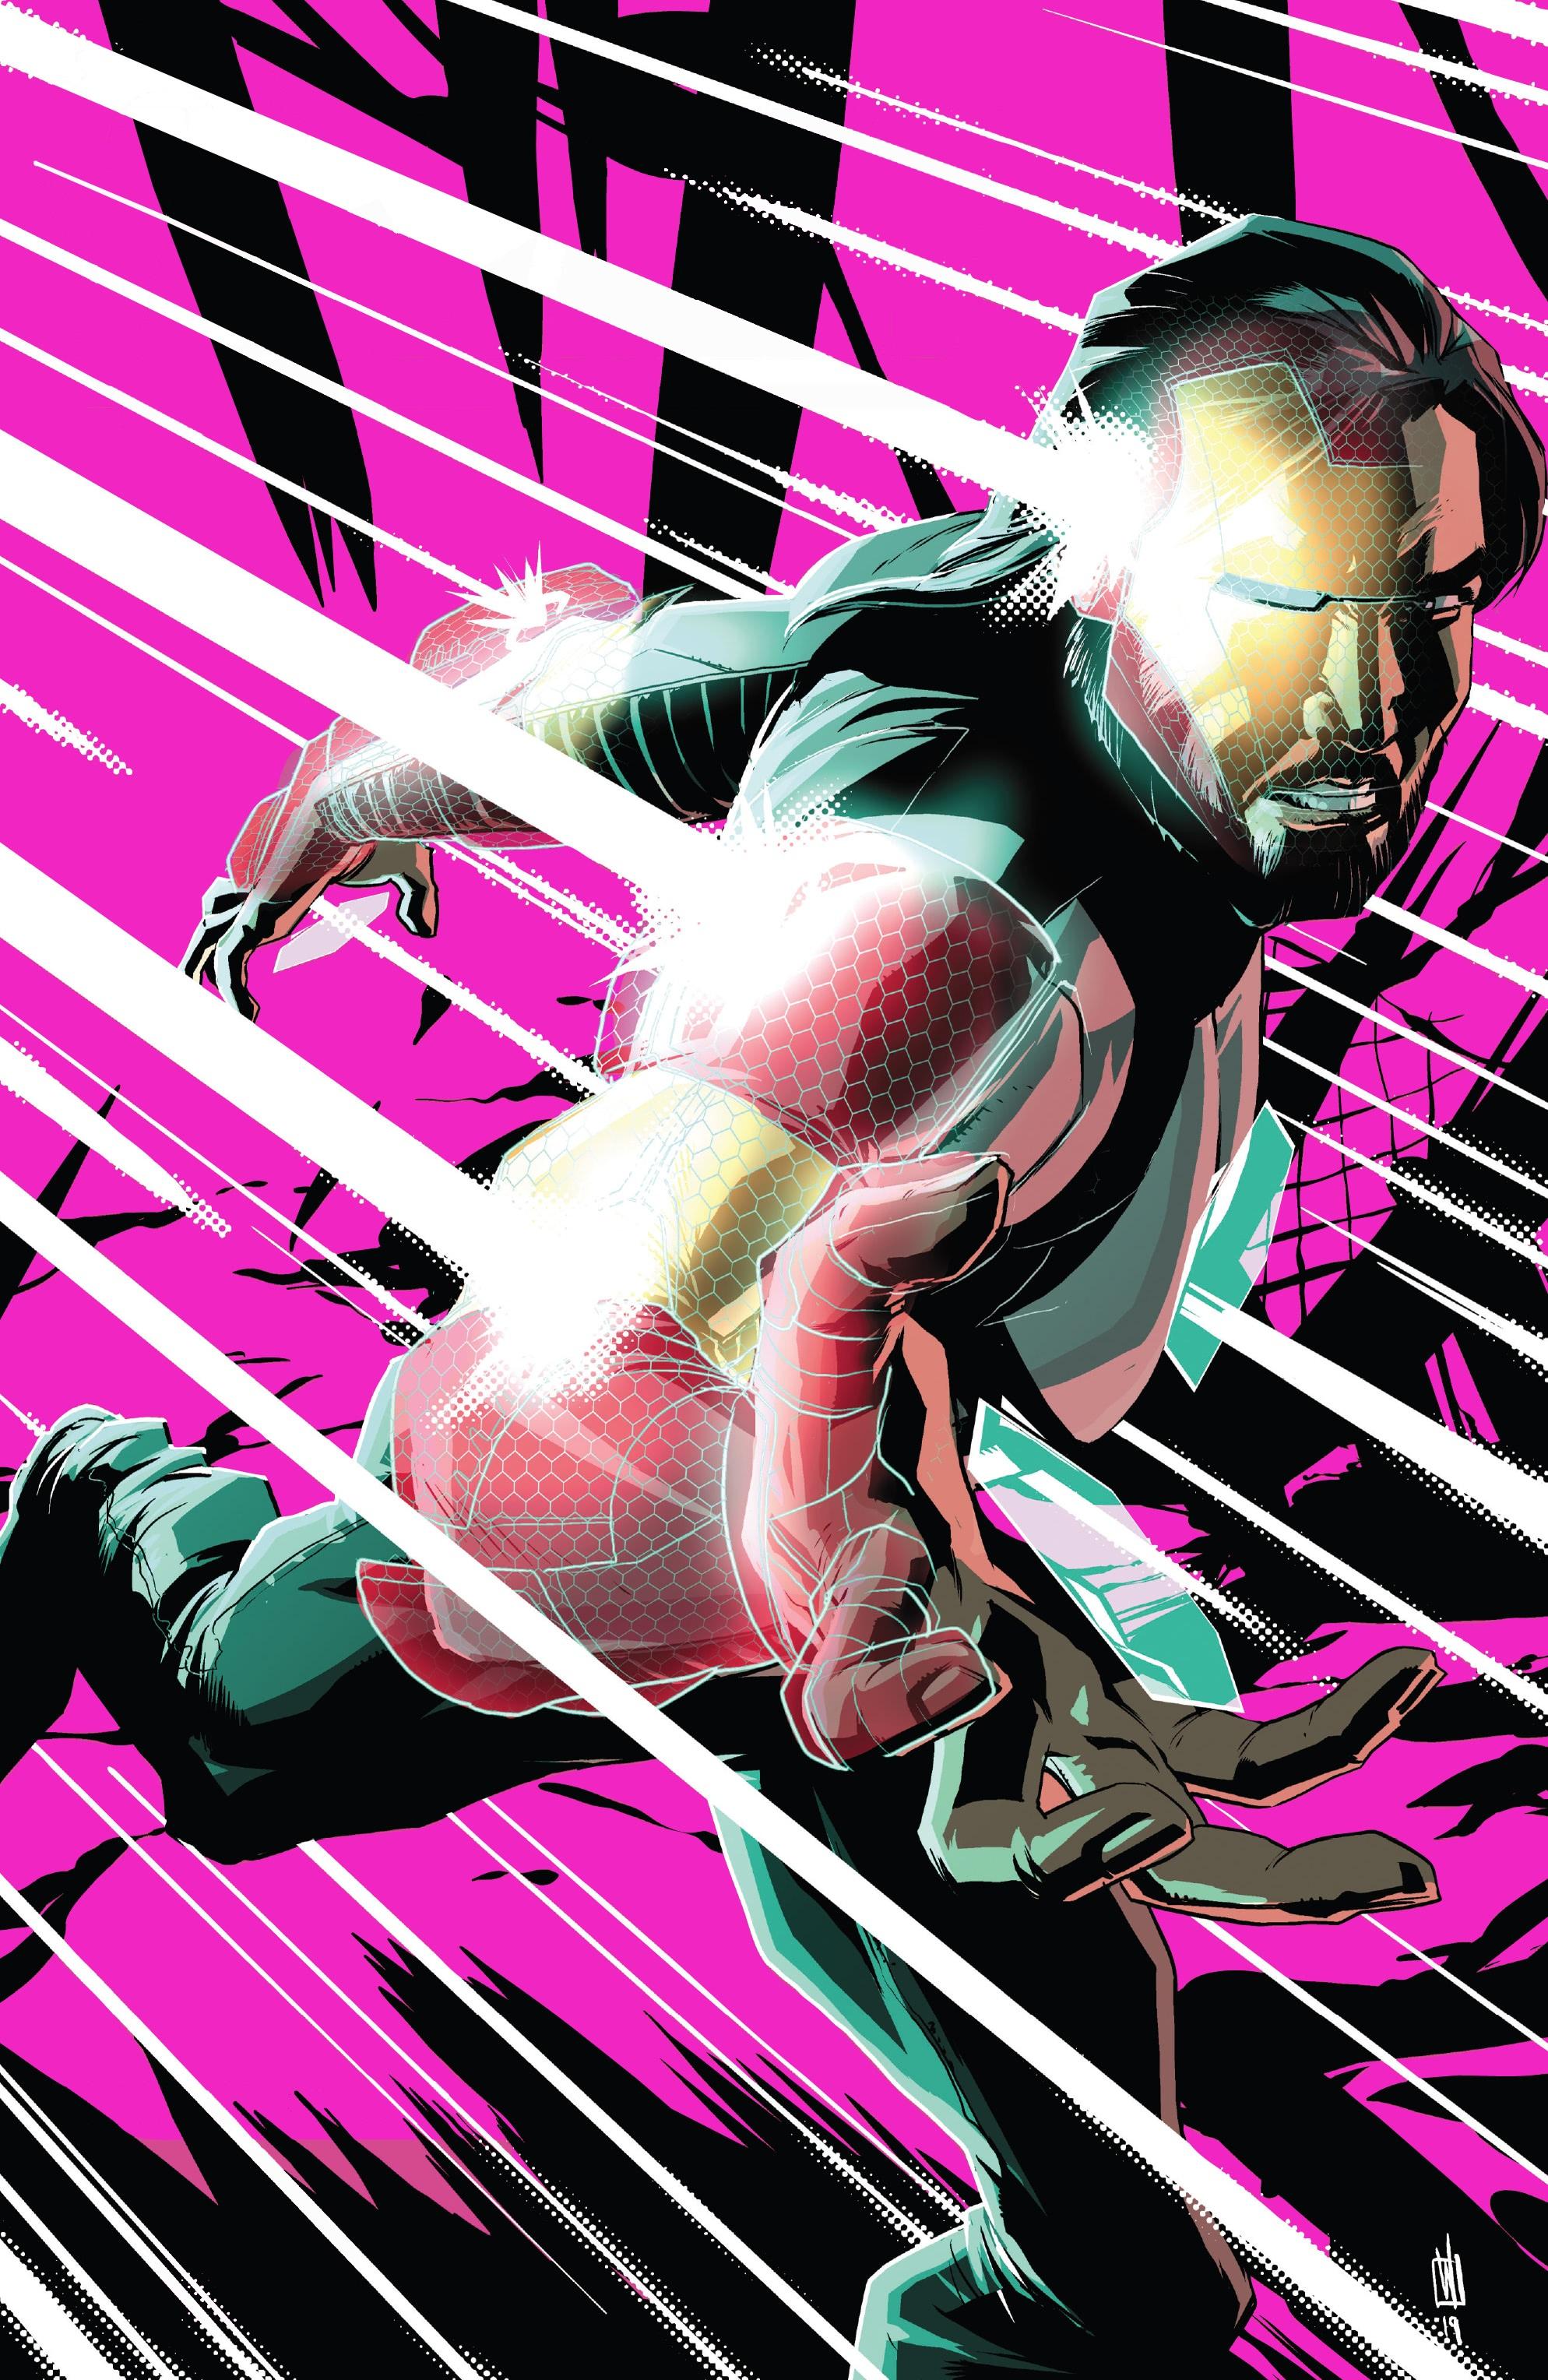 Iron Man 2020 Vol 2 5 Textless.jpg